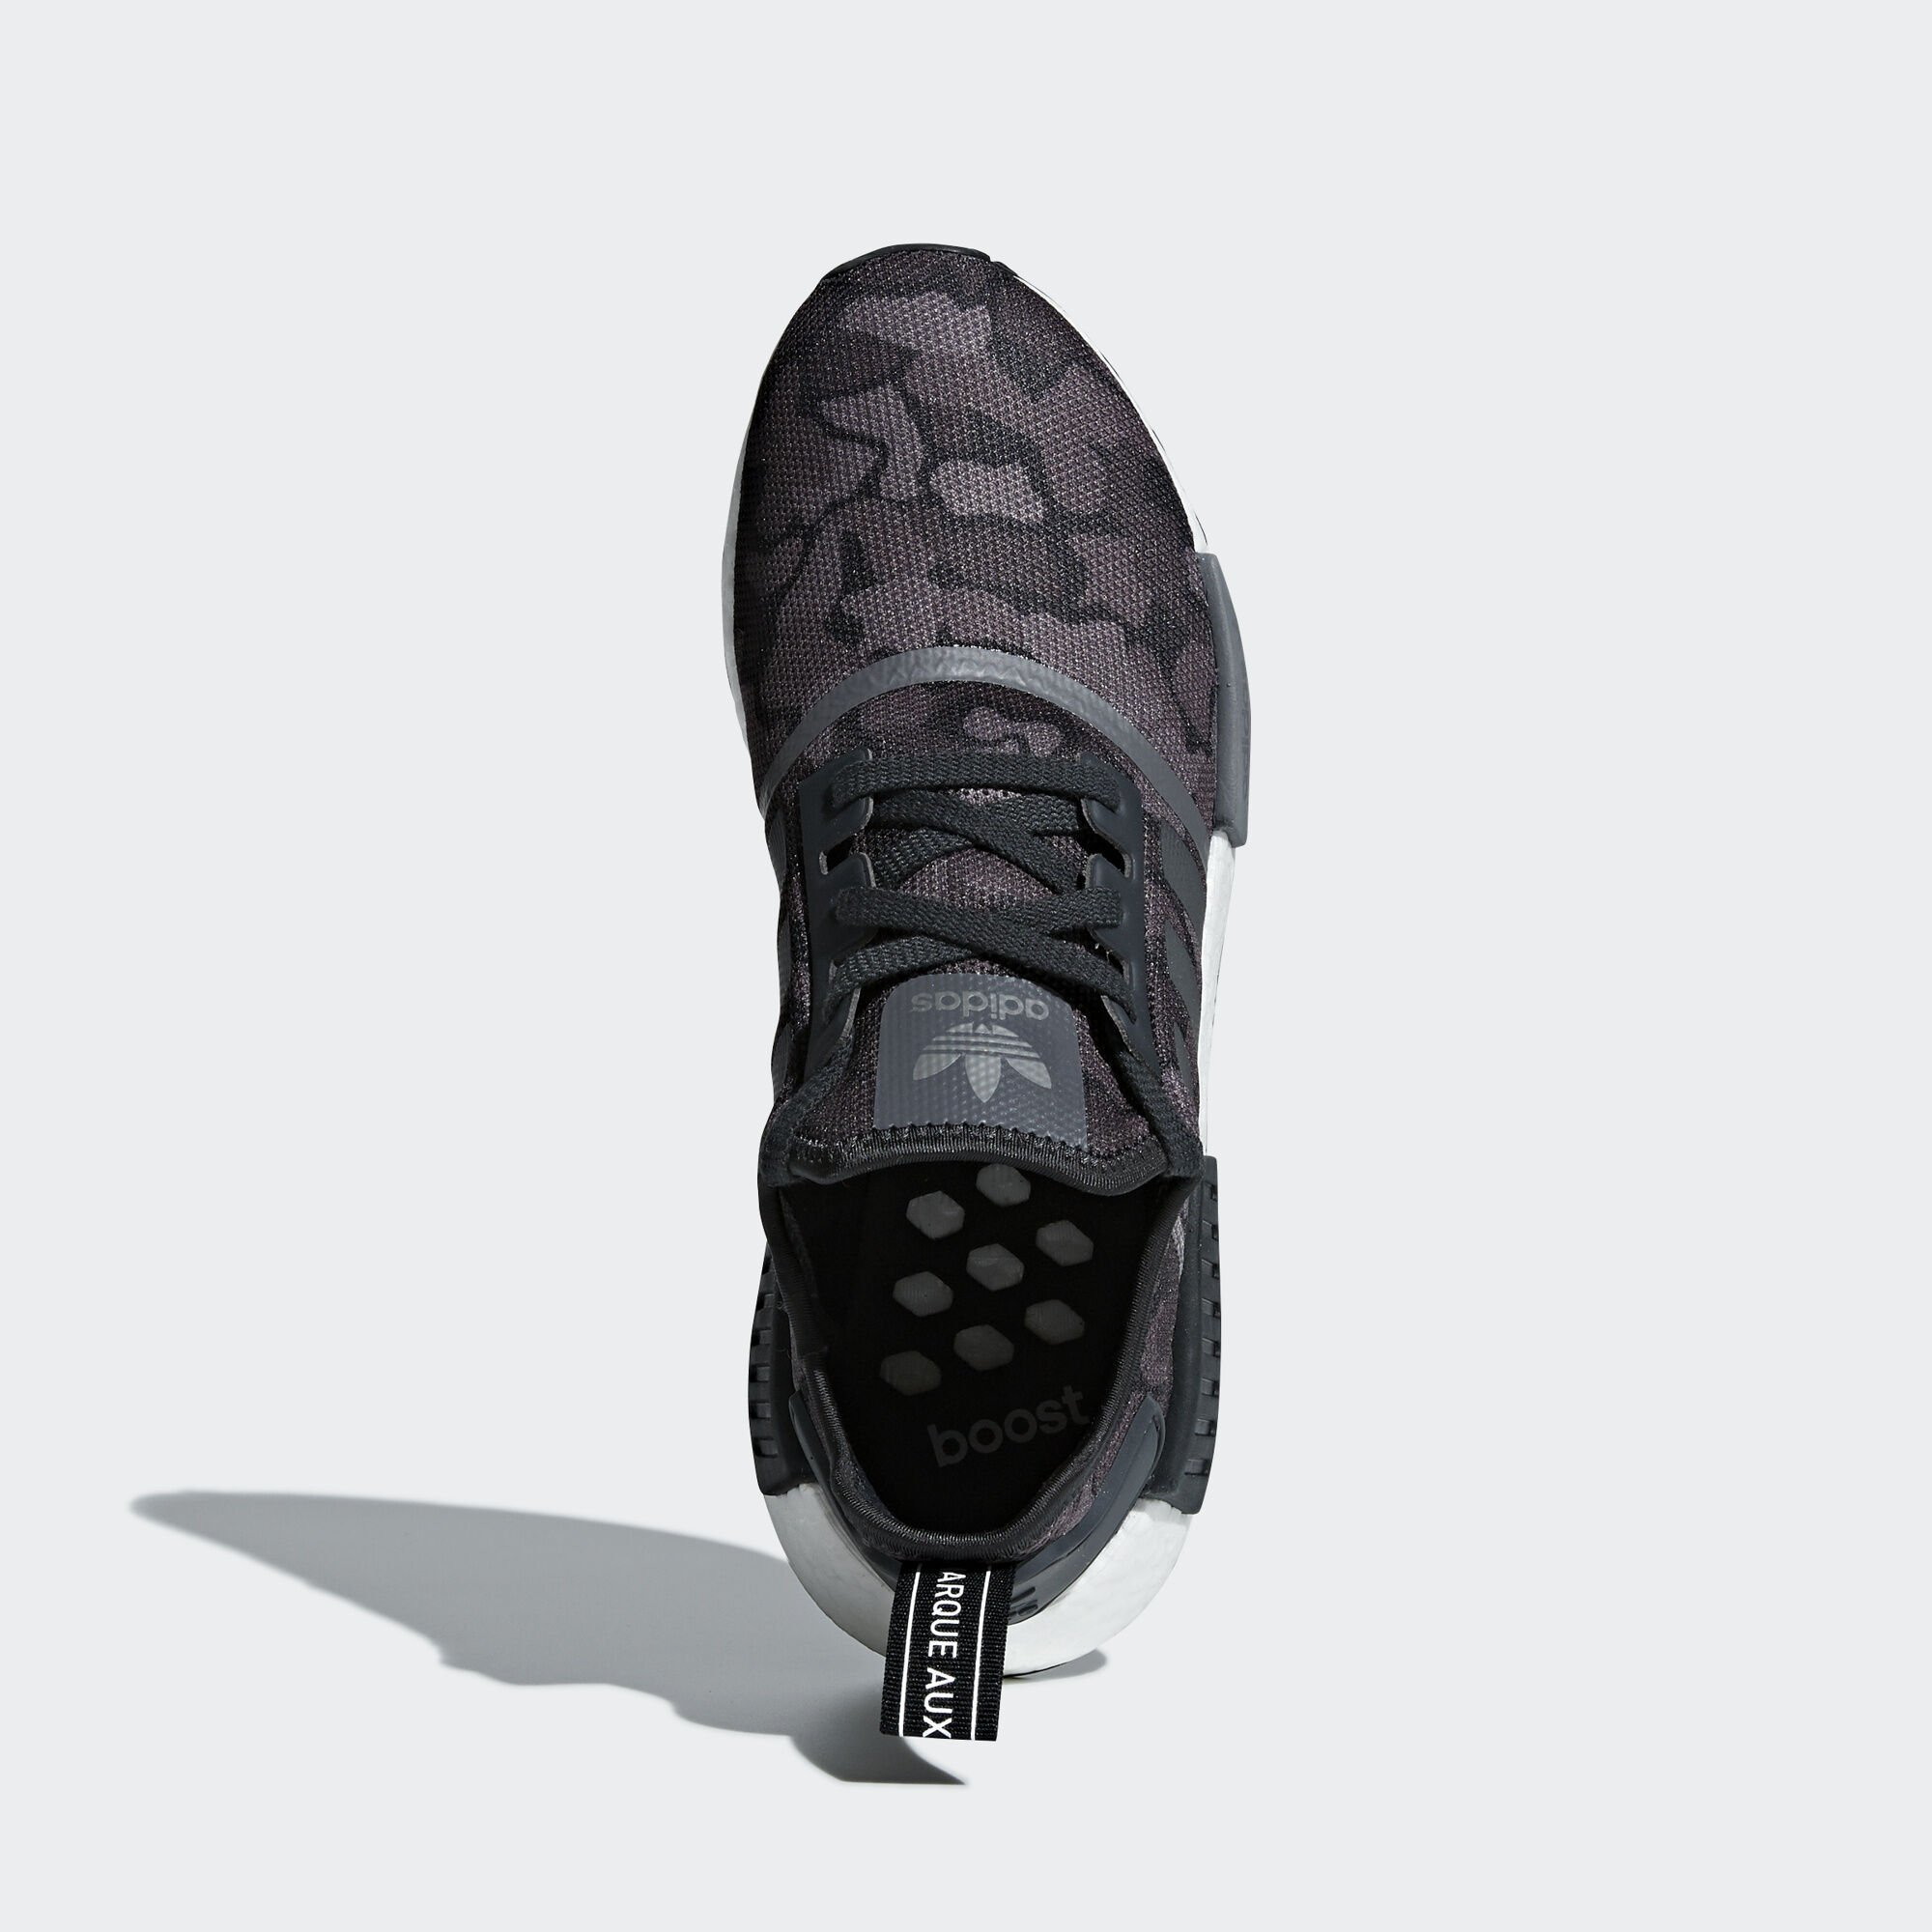 adidas NMD R1 Duck Camo Core Black (D96616)